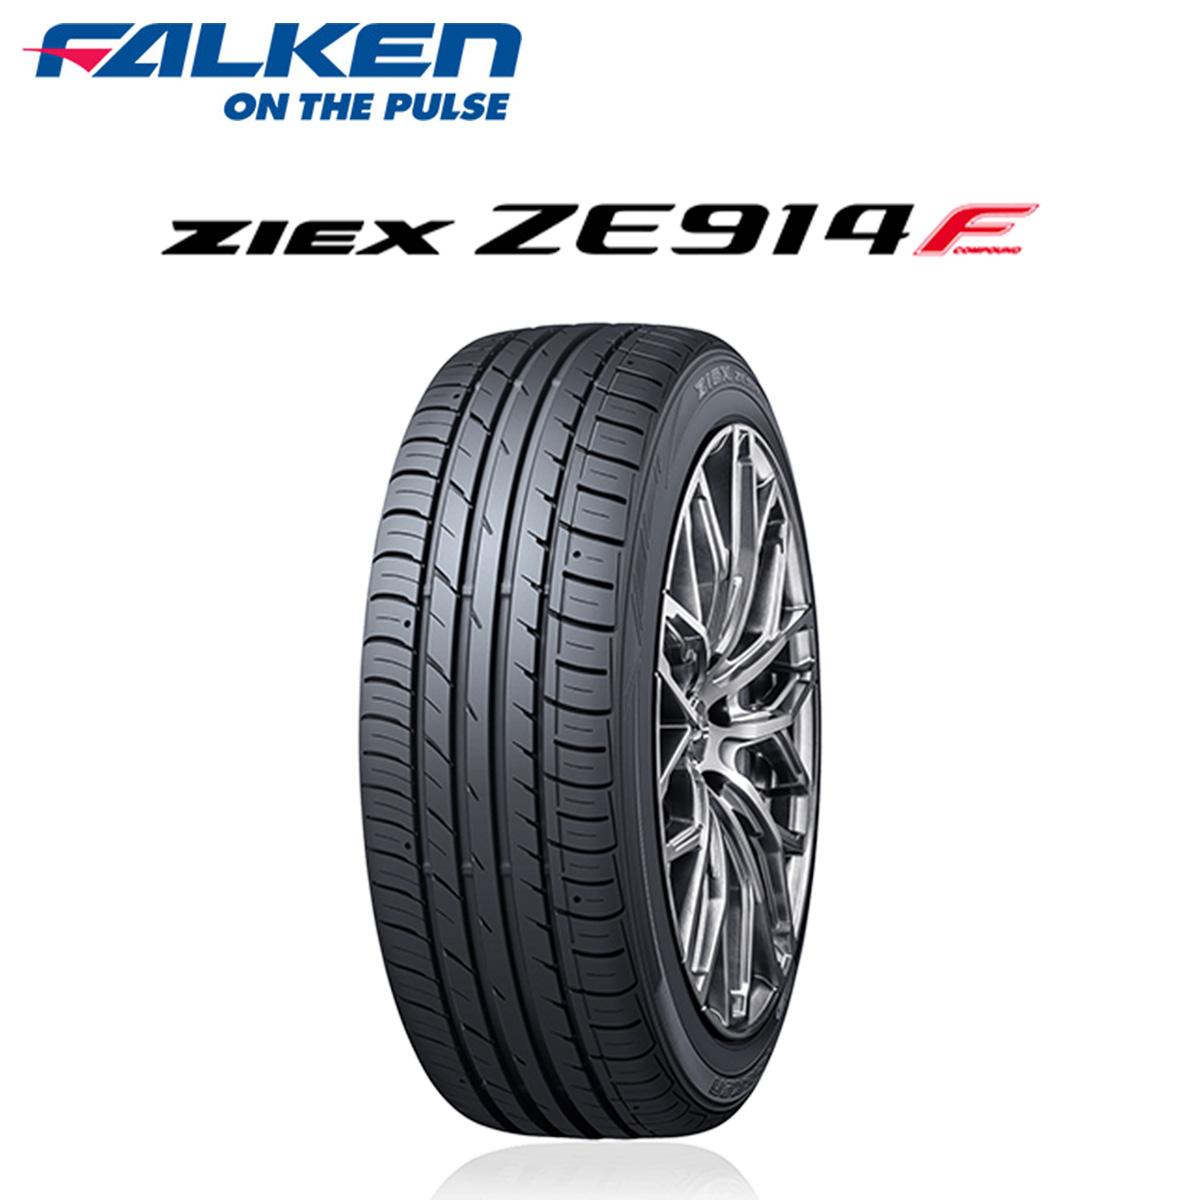 FALKEN ファルケン 低燃費 サマータイヤ 2本 17インチ 245/40R17 ZIEX ZE914F ジークス